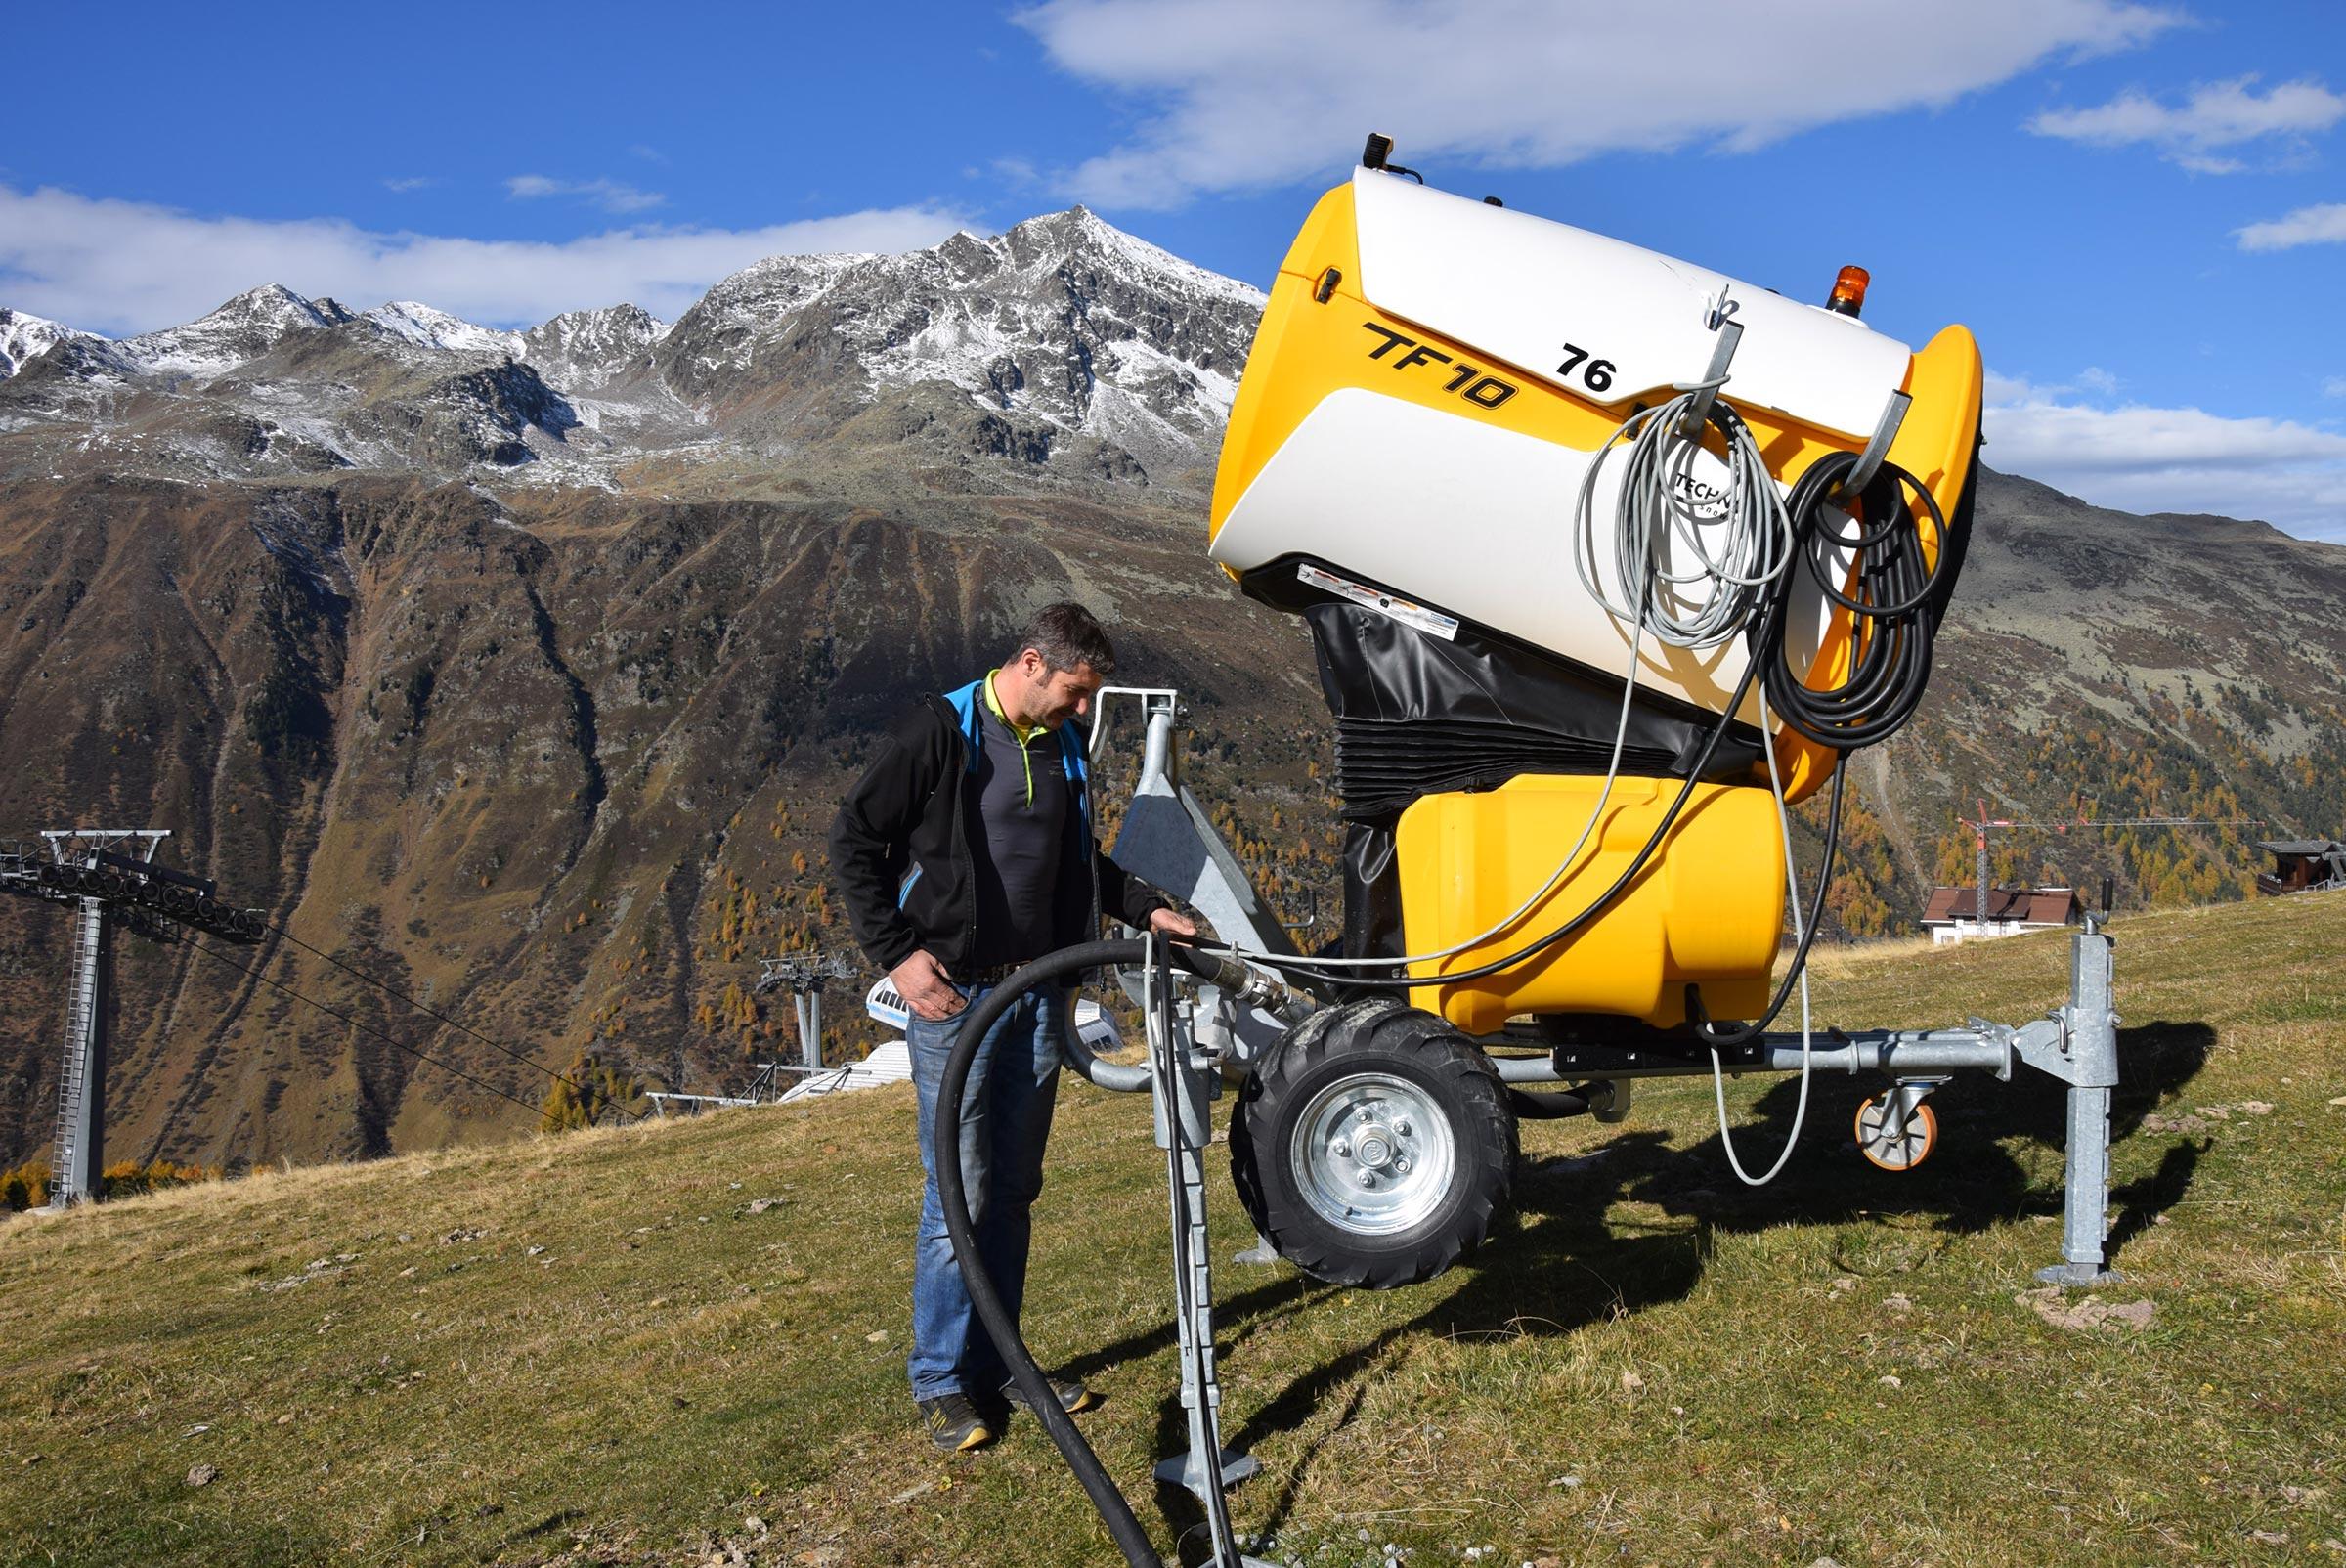 Peter bei Schneekanone - Skigebiet Obergurgl-Hochgurgl